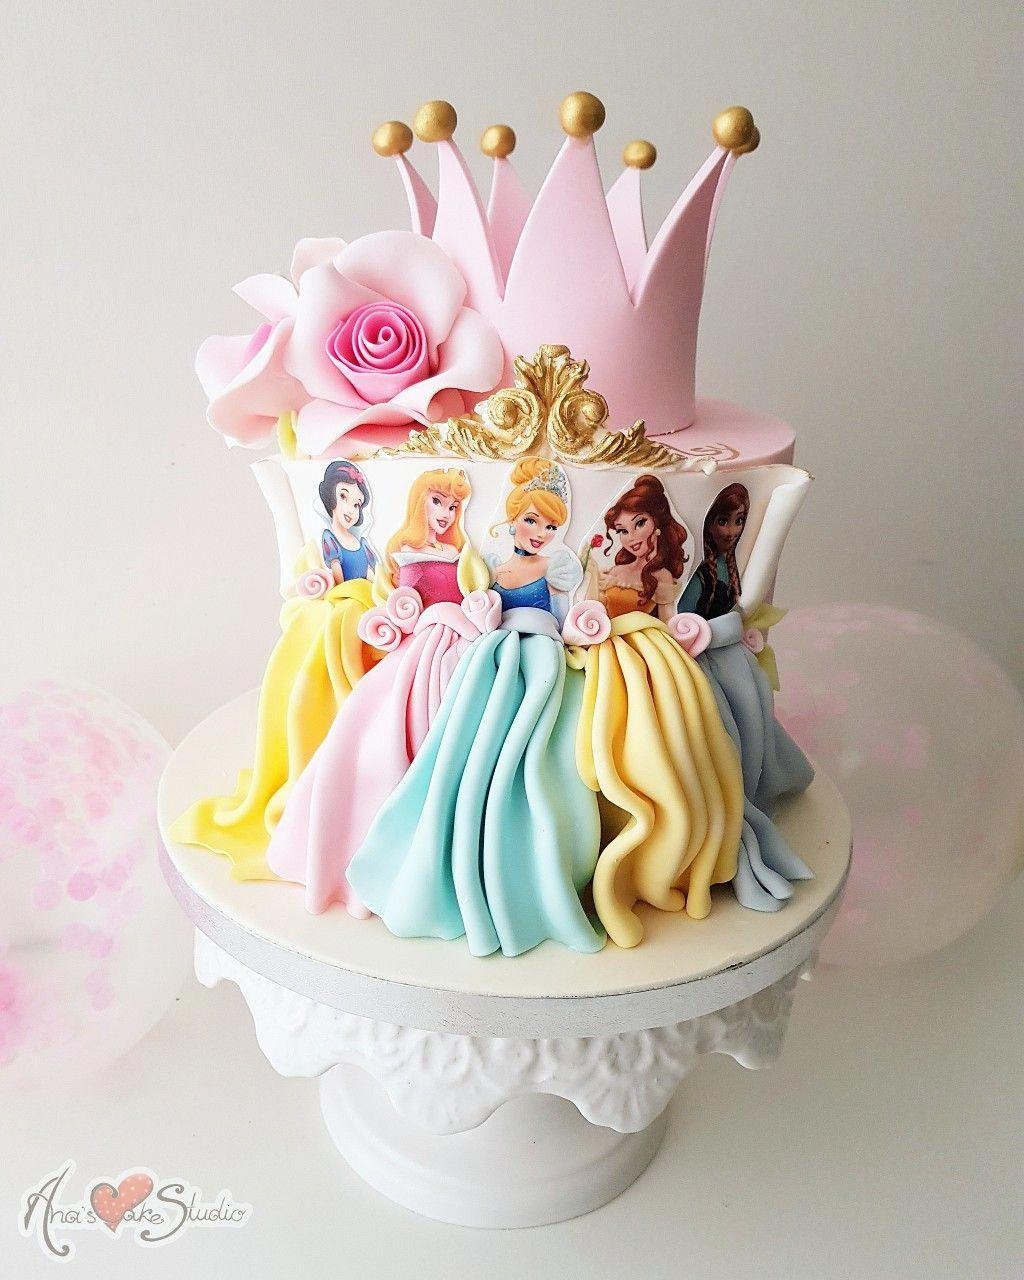 Pleasant Cupcake At Cookeo Recipe In 2020 Princess Birthday Cake Funny Birthday Cards Online Inifodamsfinfo